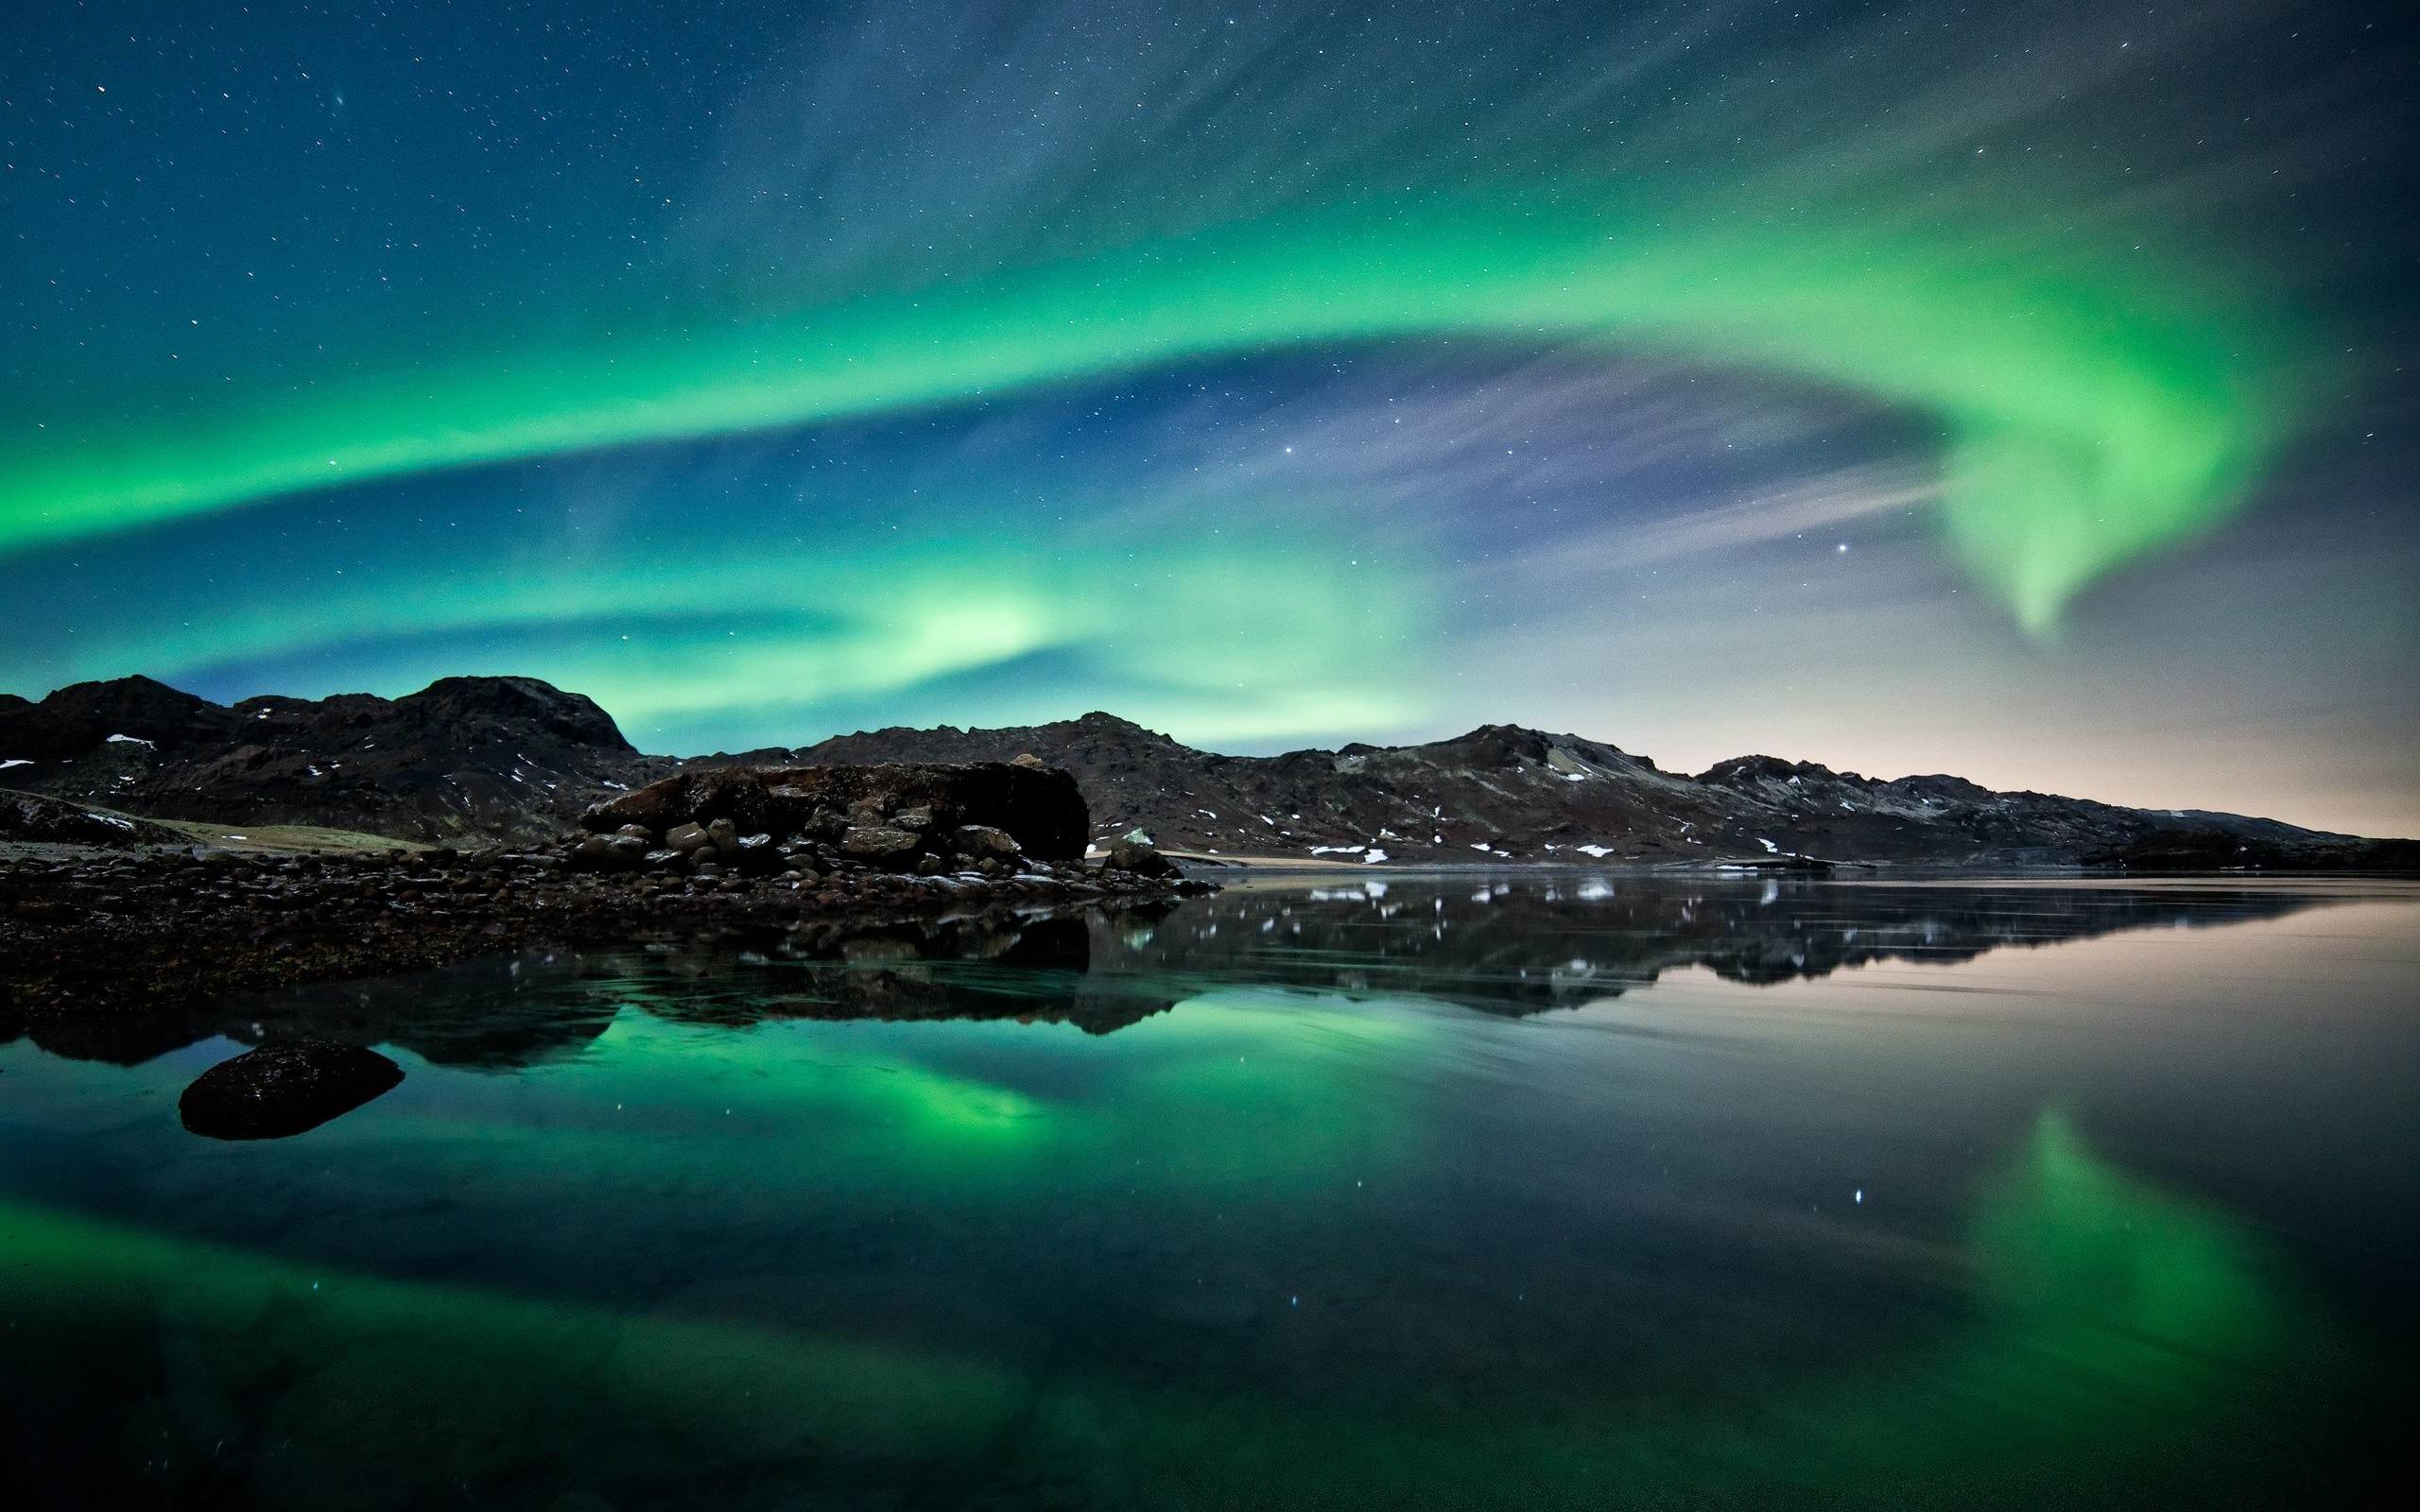 Norwegian Northern Lights Hd Desktop Wallpaper Preview 10wallpaper Com